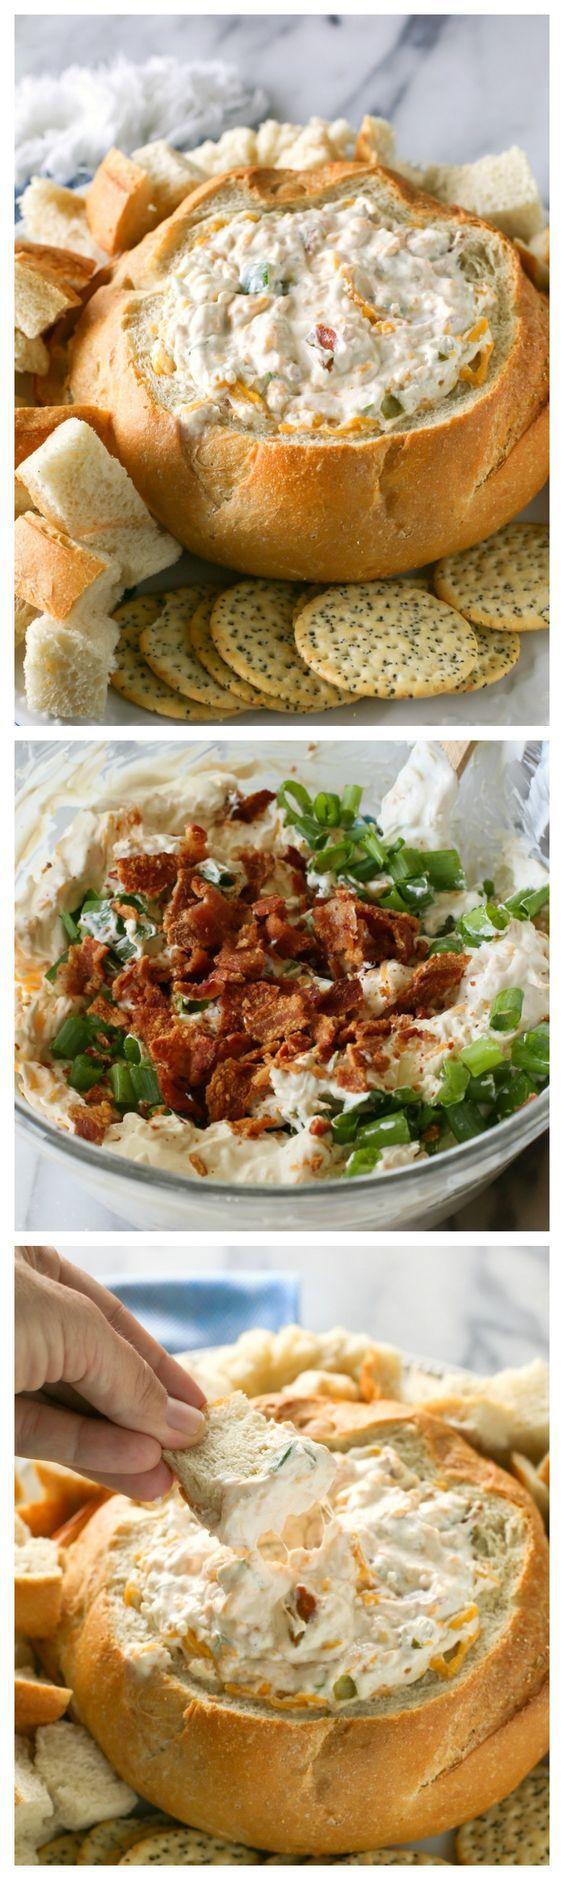 ... Cheese Dip - a creamy bacon and cheese dip baked in sourdough bread